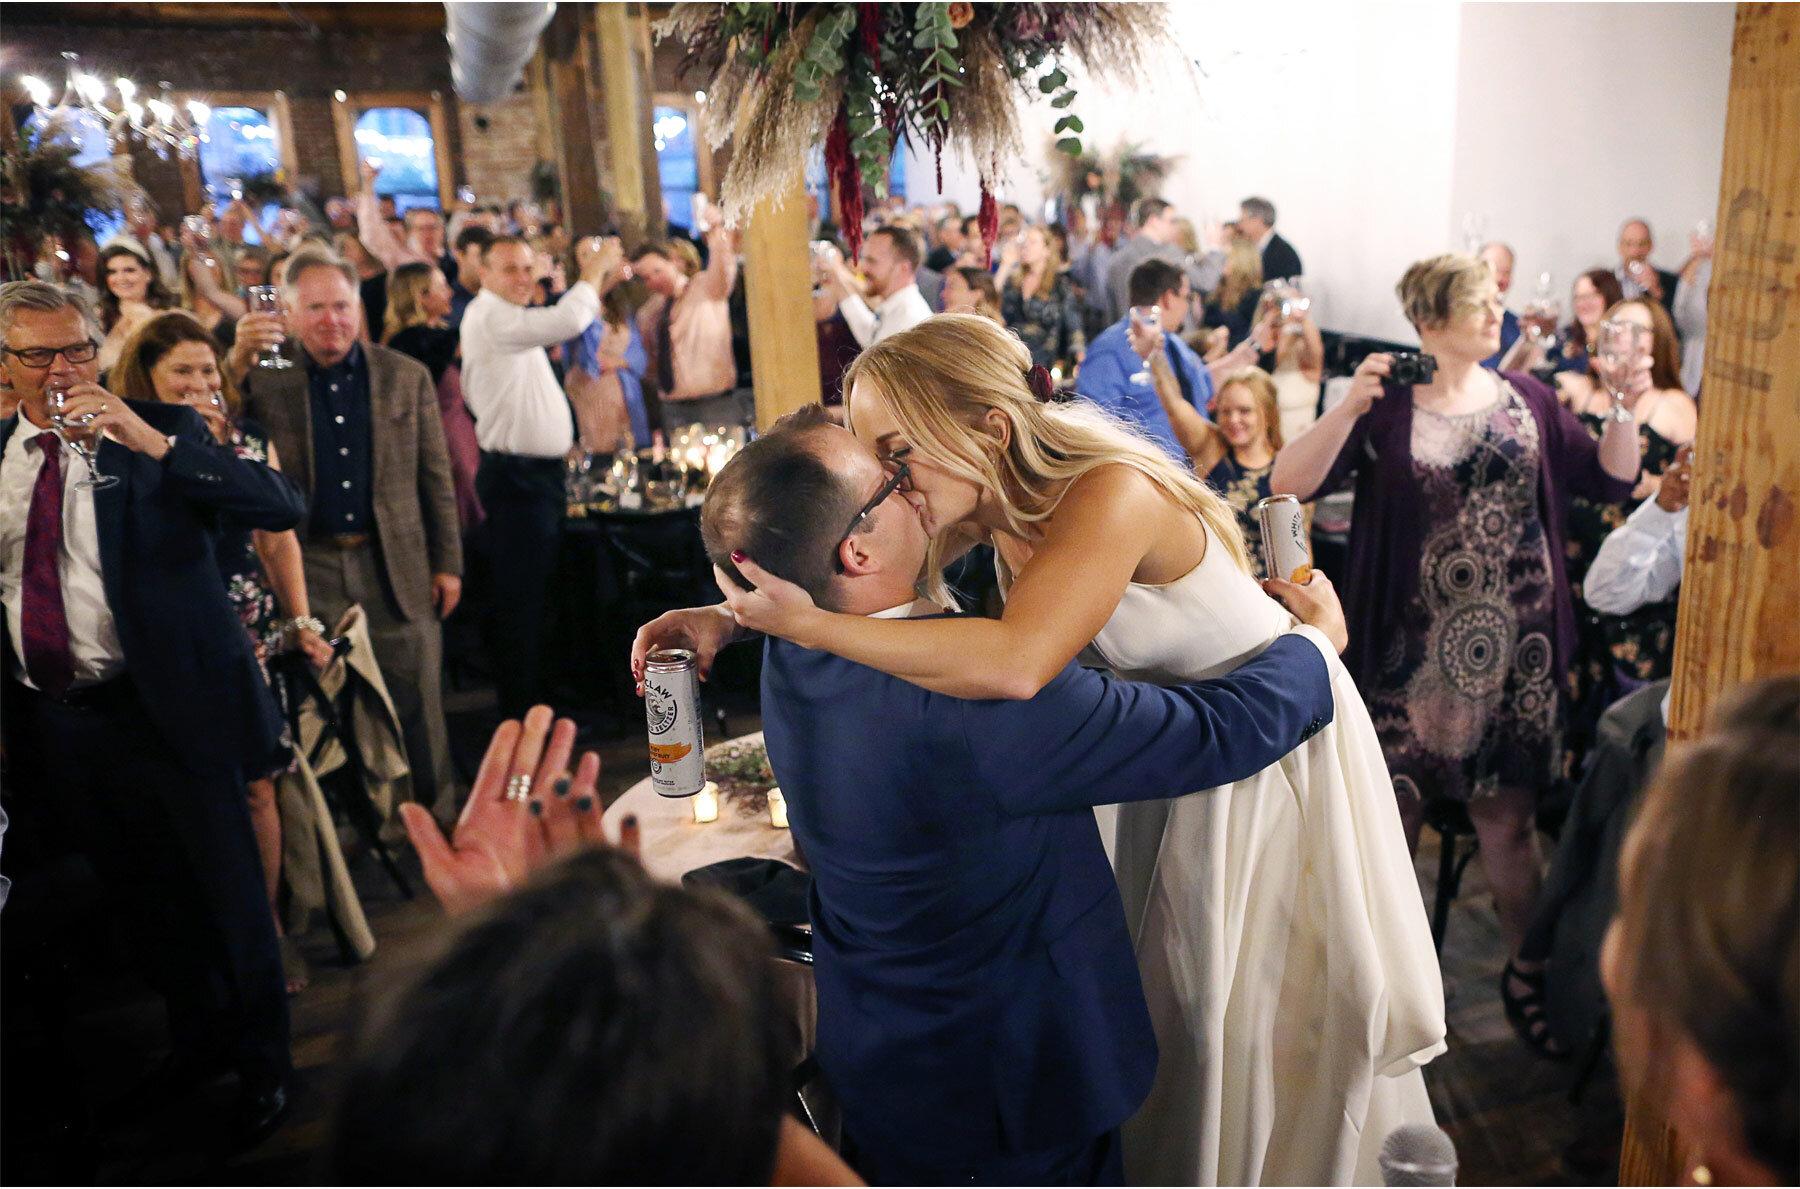 15-Vick-Photography-Wedding-Minneapolis-Minnesota-Earl-and-Wilson-Bride-Groom-Reception-Toast-Kiss-Danielle-and-Tom.jpg